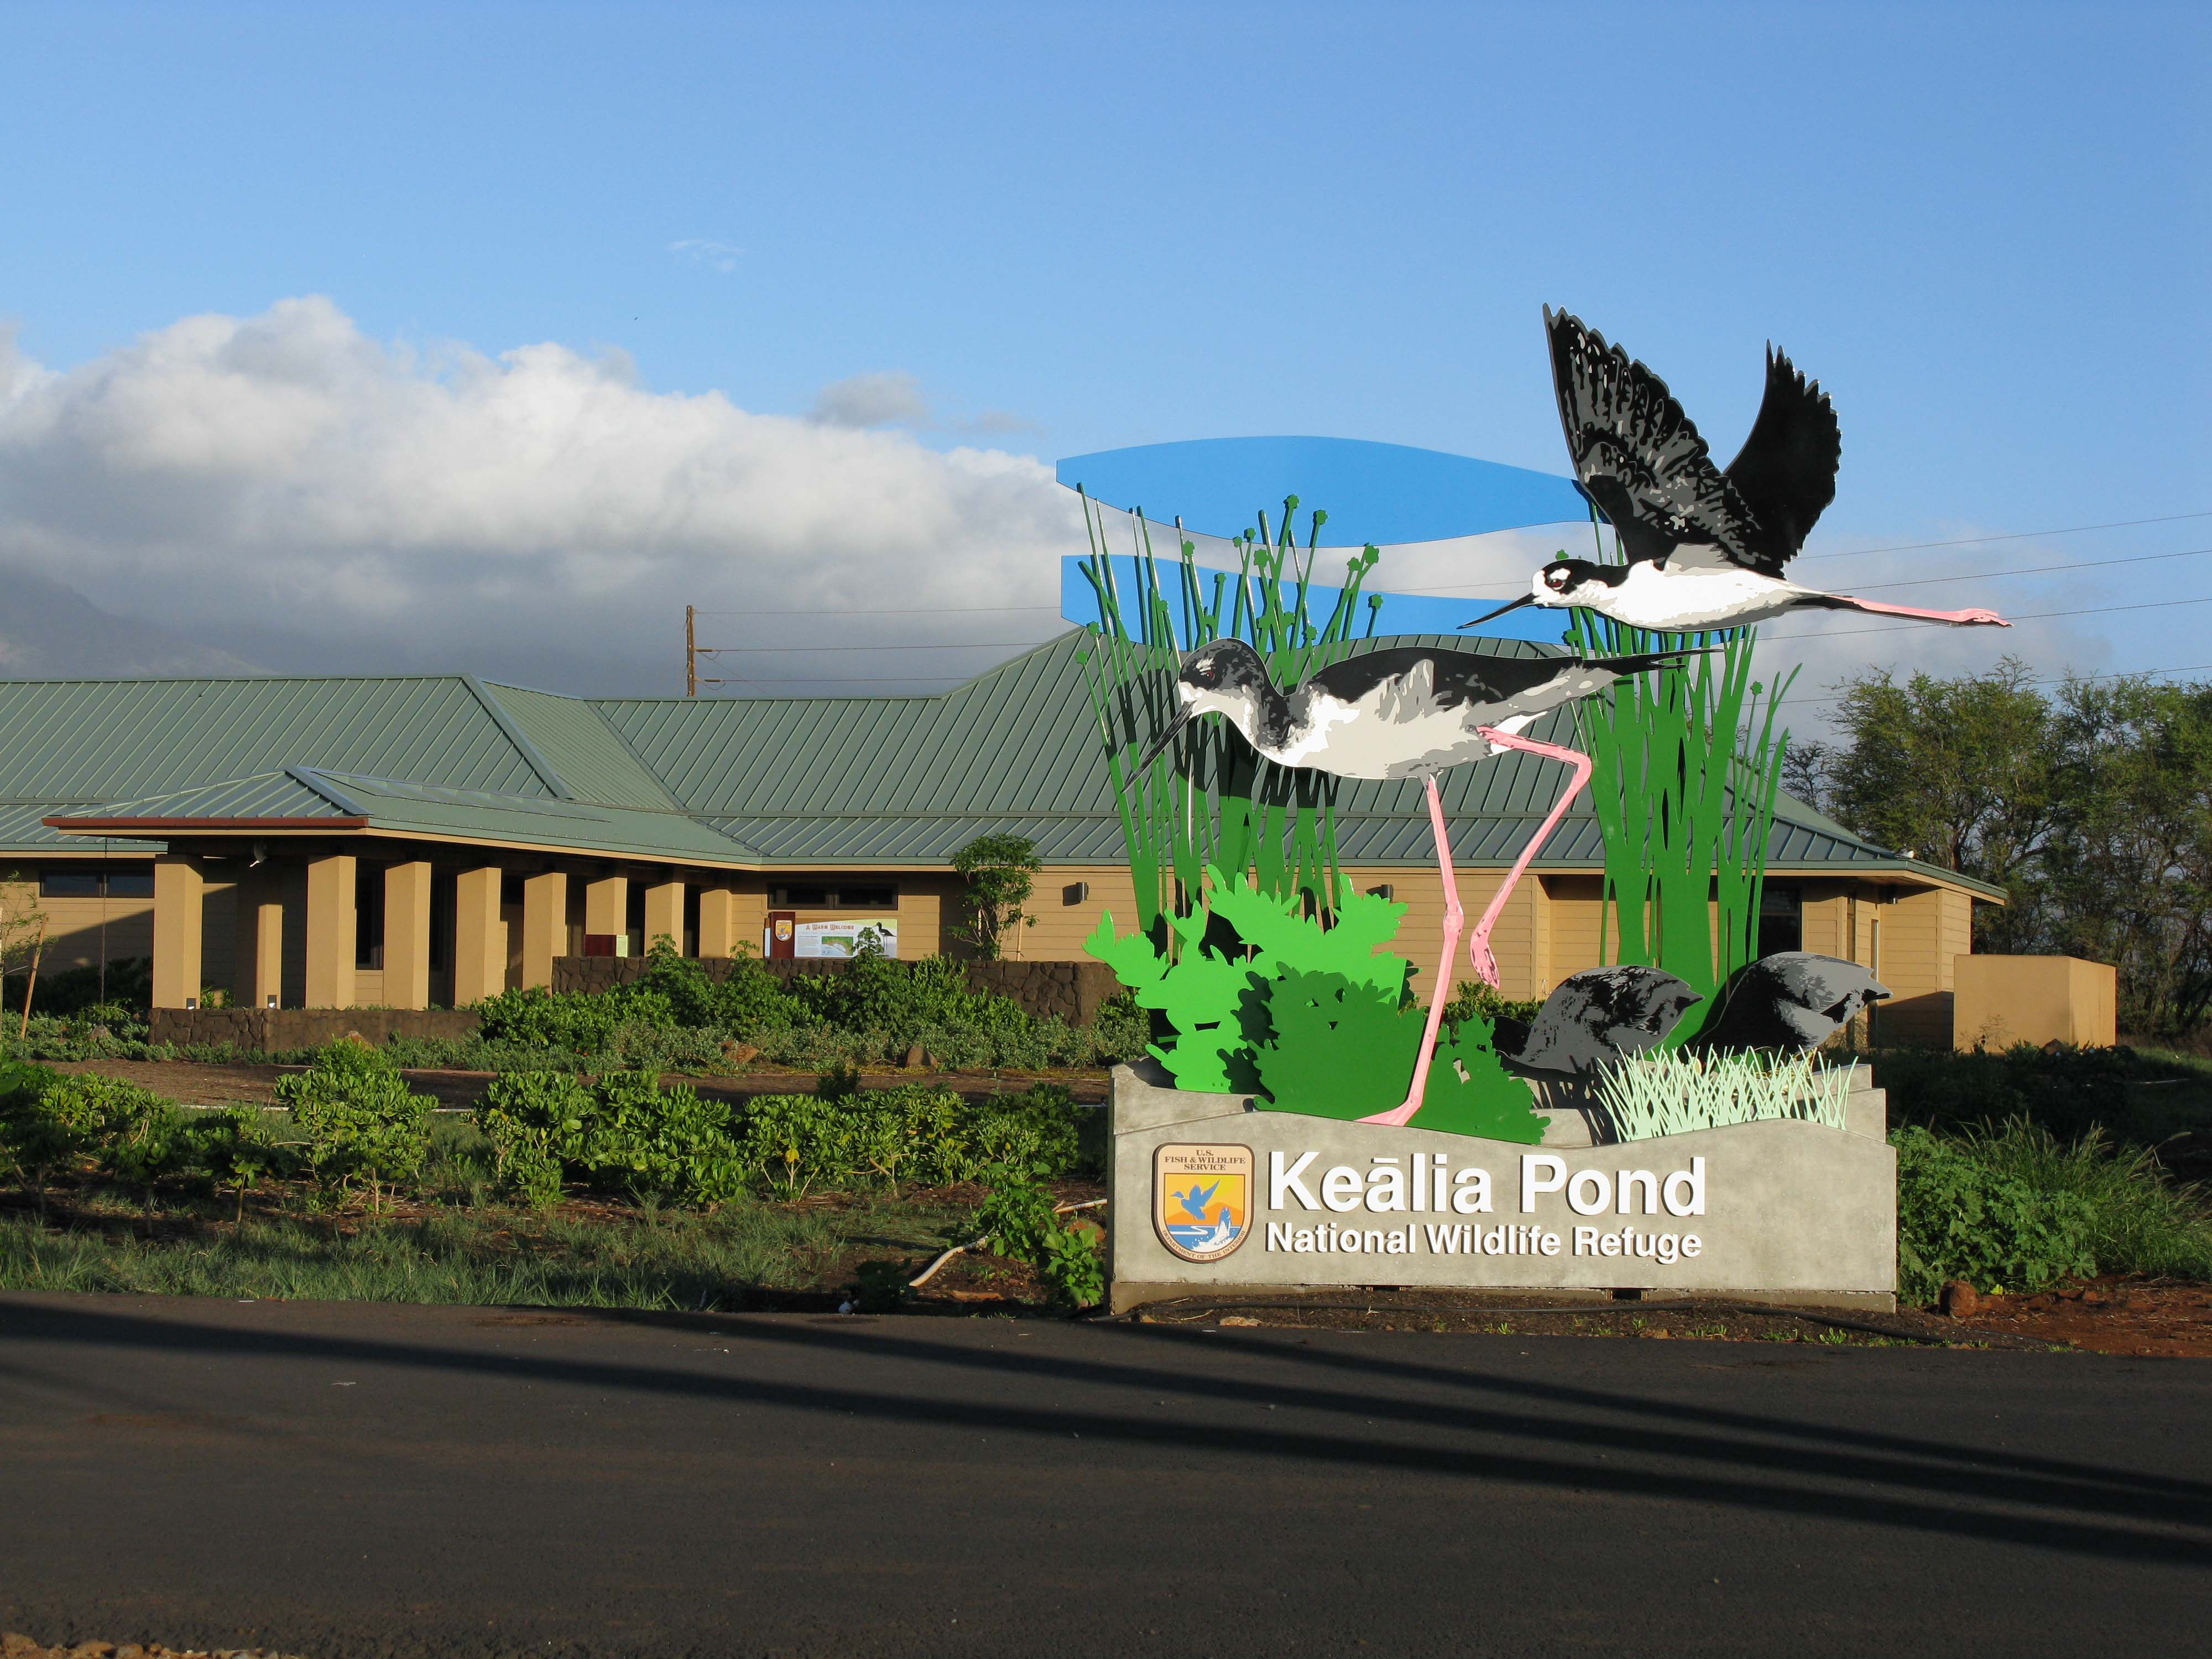 Keālia Pond National Wildlife Refuge Closed in Preparation for Lane